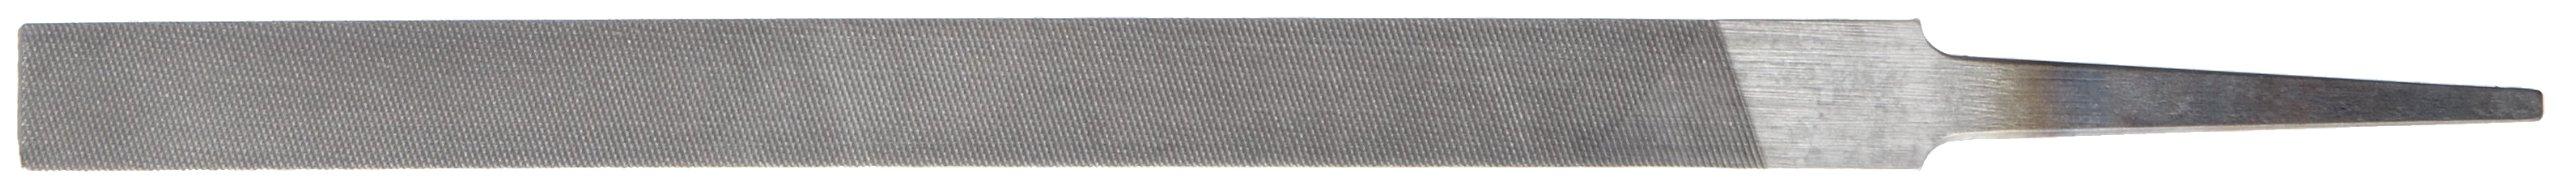 Nicholson Pillar File, Swiss Pattern, Double Cut, Rectangular, #0 Coarseness, 6'' Length by Apex Tool Group